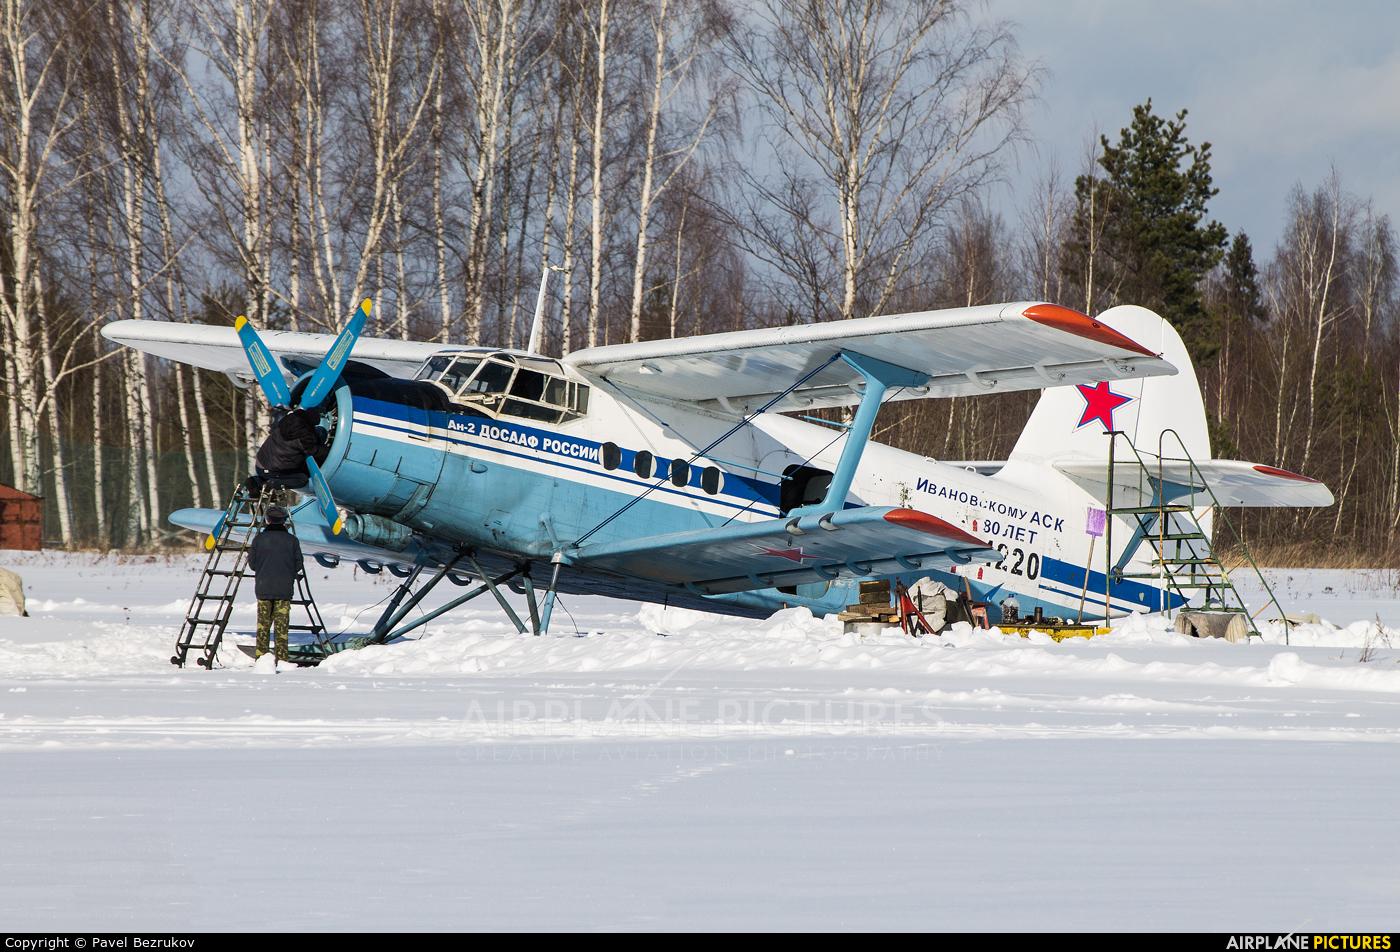 DOSAAF / ROSTO RF-01220 aircraft at Ivanovo - Yasunikha